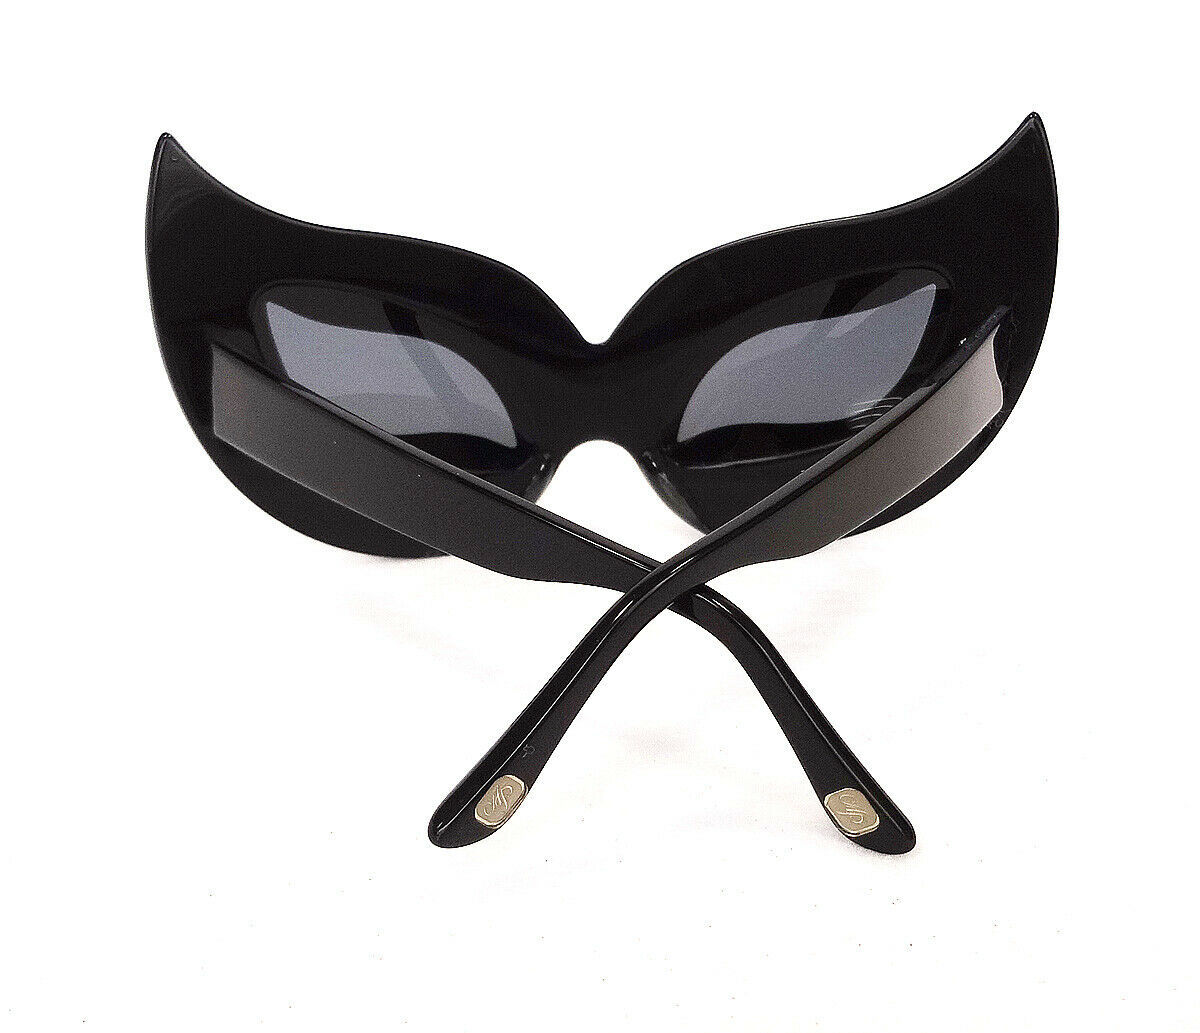 AGENT PROVOCATEUR x LINDA FARROW Disguise Me Black Silver Mask JAPAN - New!